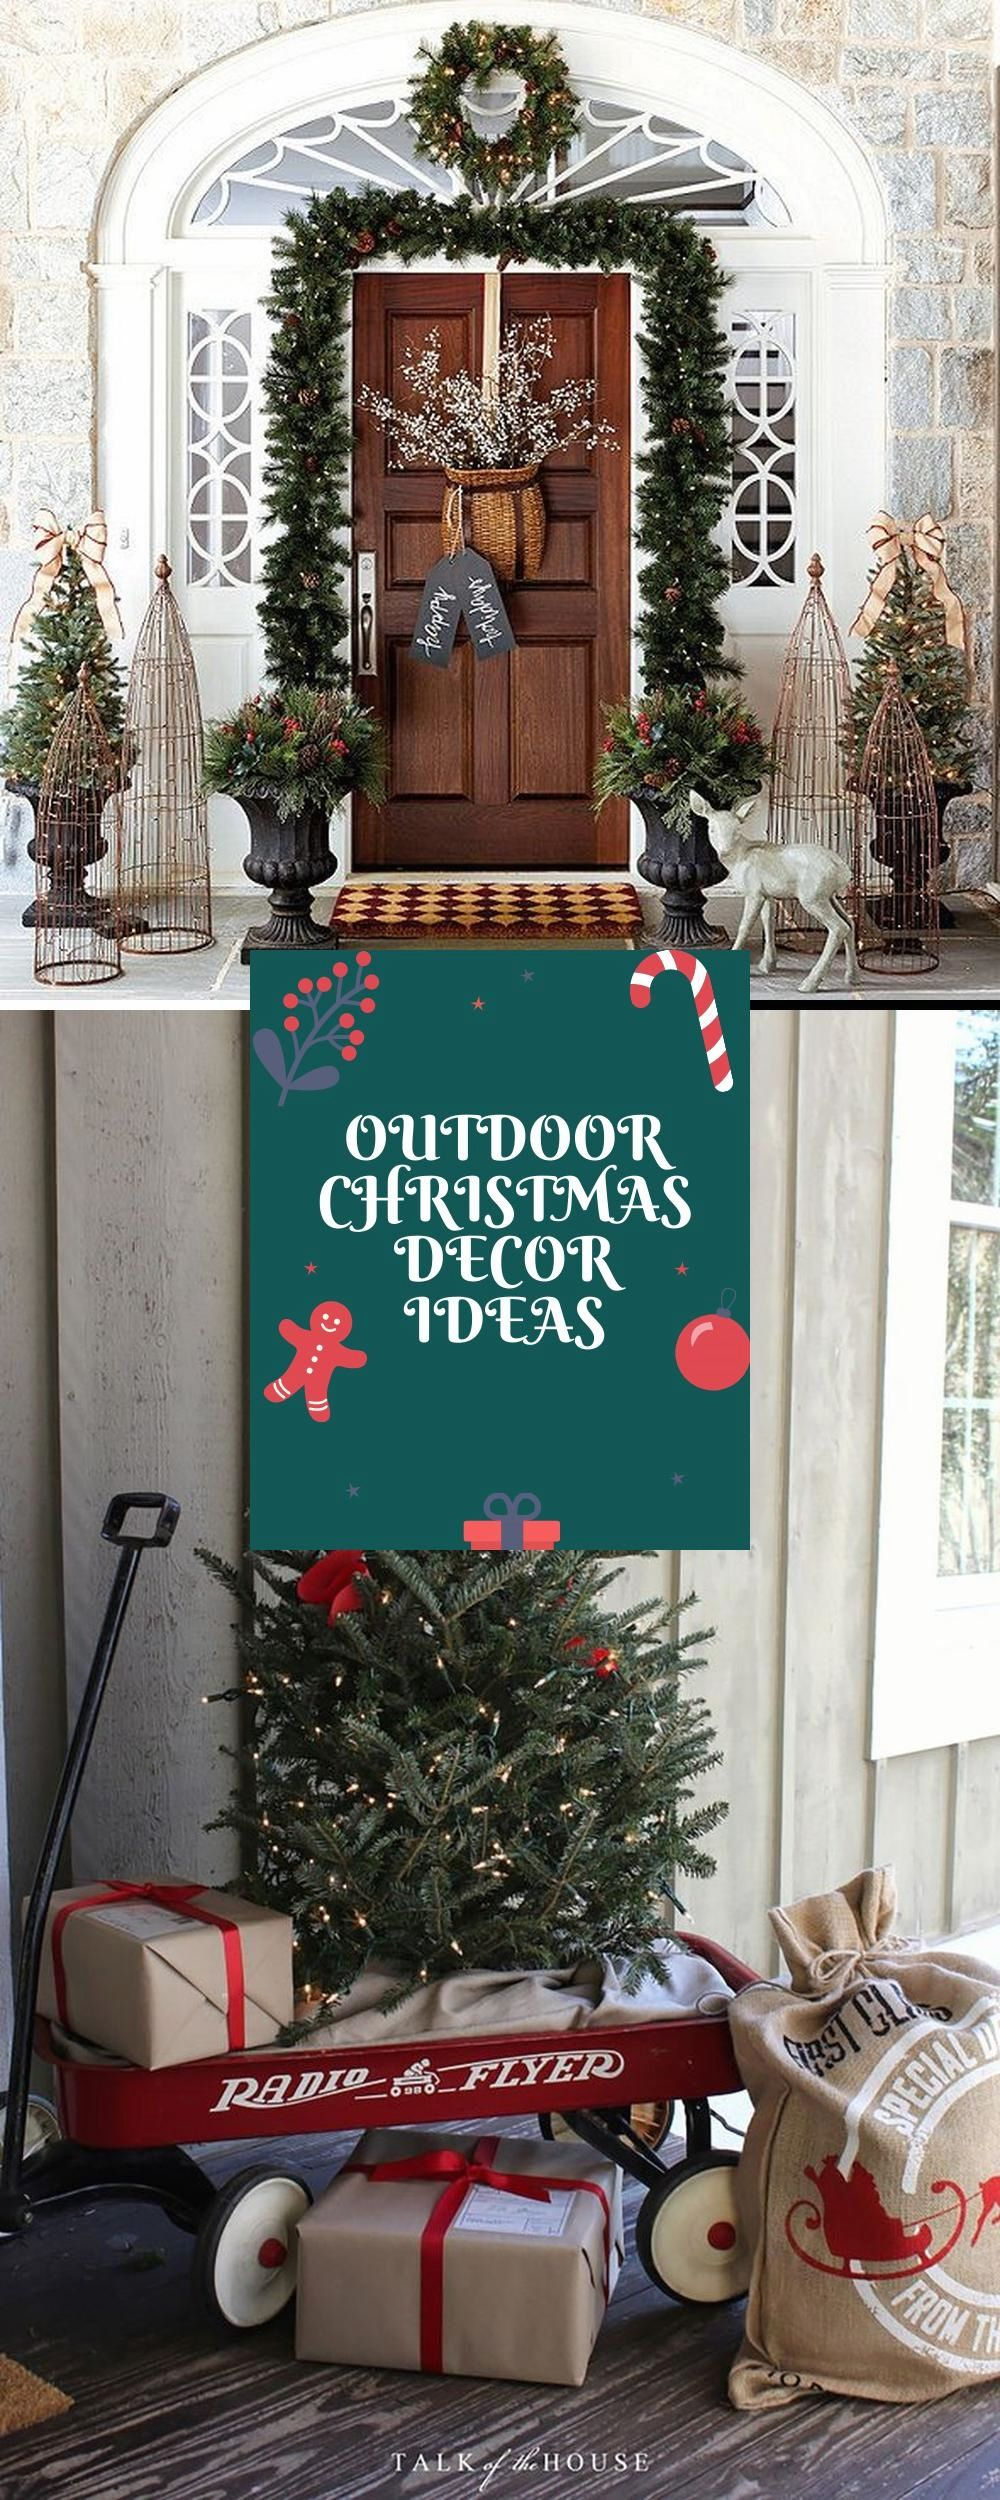 Outdoor Christmas Decorations Diy Ideas Christmas Decorations Diy Outdoor Outdoor Christmas Outdoor Christmas Decorations